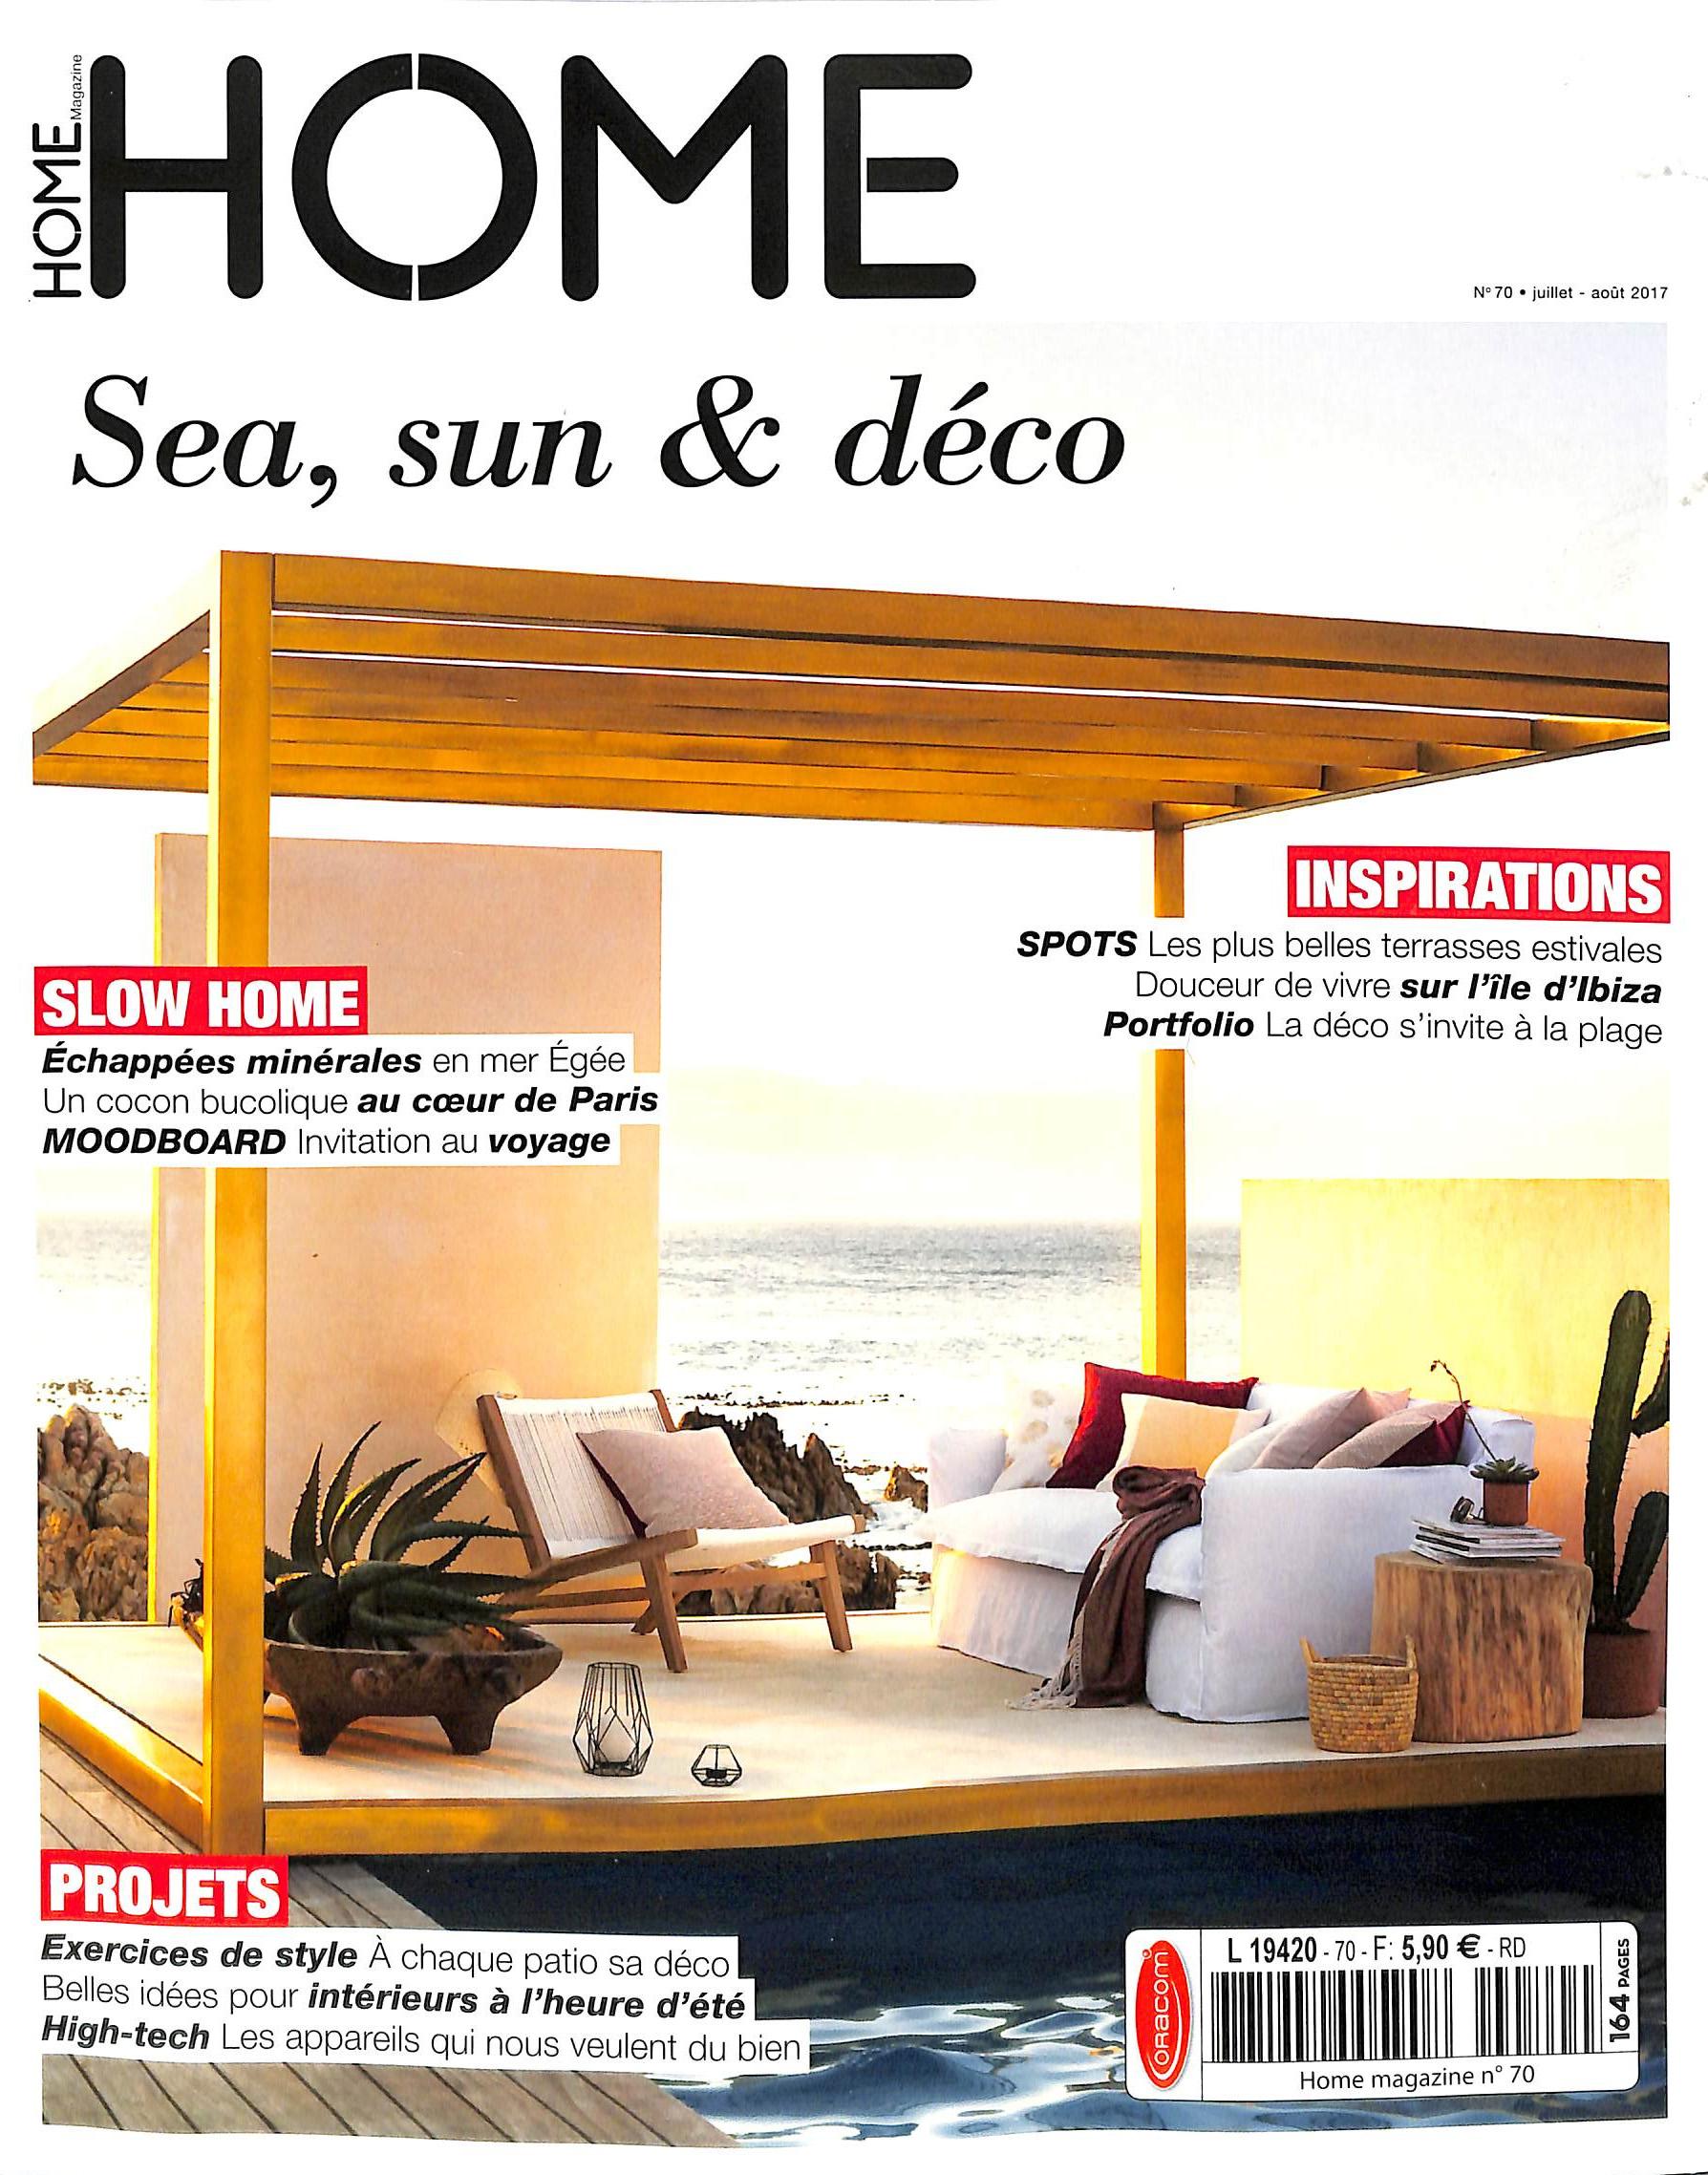 Home Magazine Juillet-Août 2017